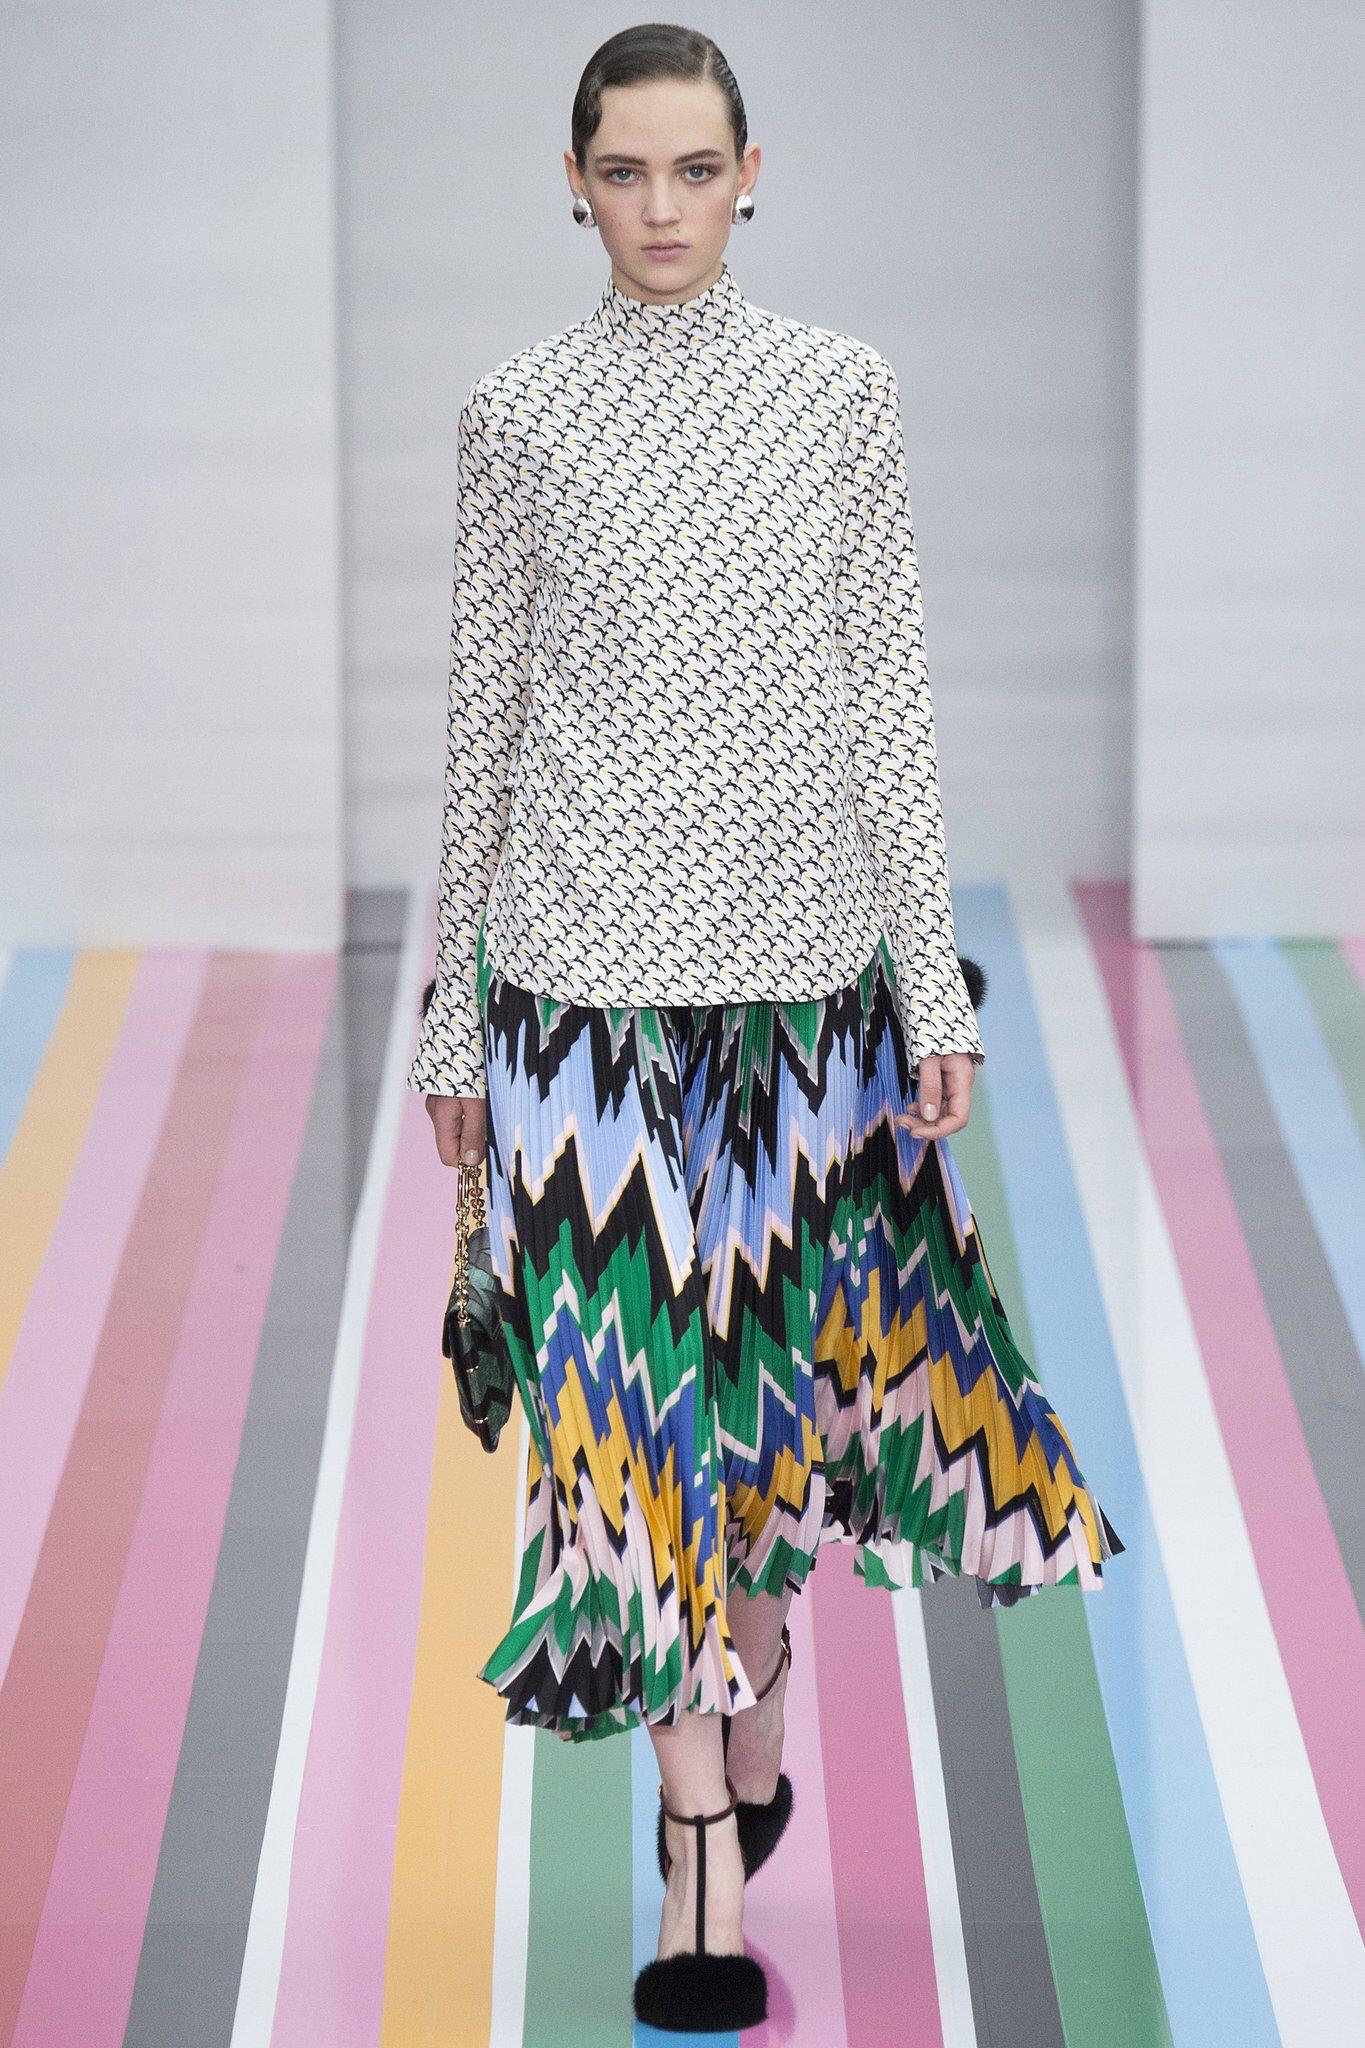 ecuador negocio Pebish  Salvatore Ferragamo Fall 2016 Ready-to-Wear Fashion Show   Fashion, Pleated  fabric, Fashion show